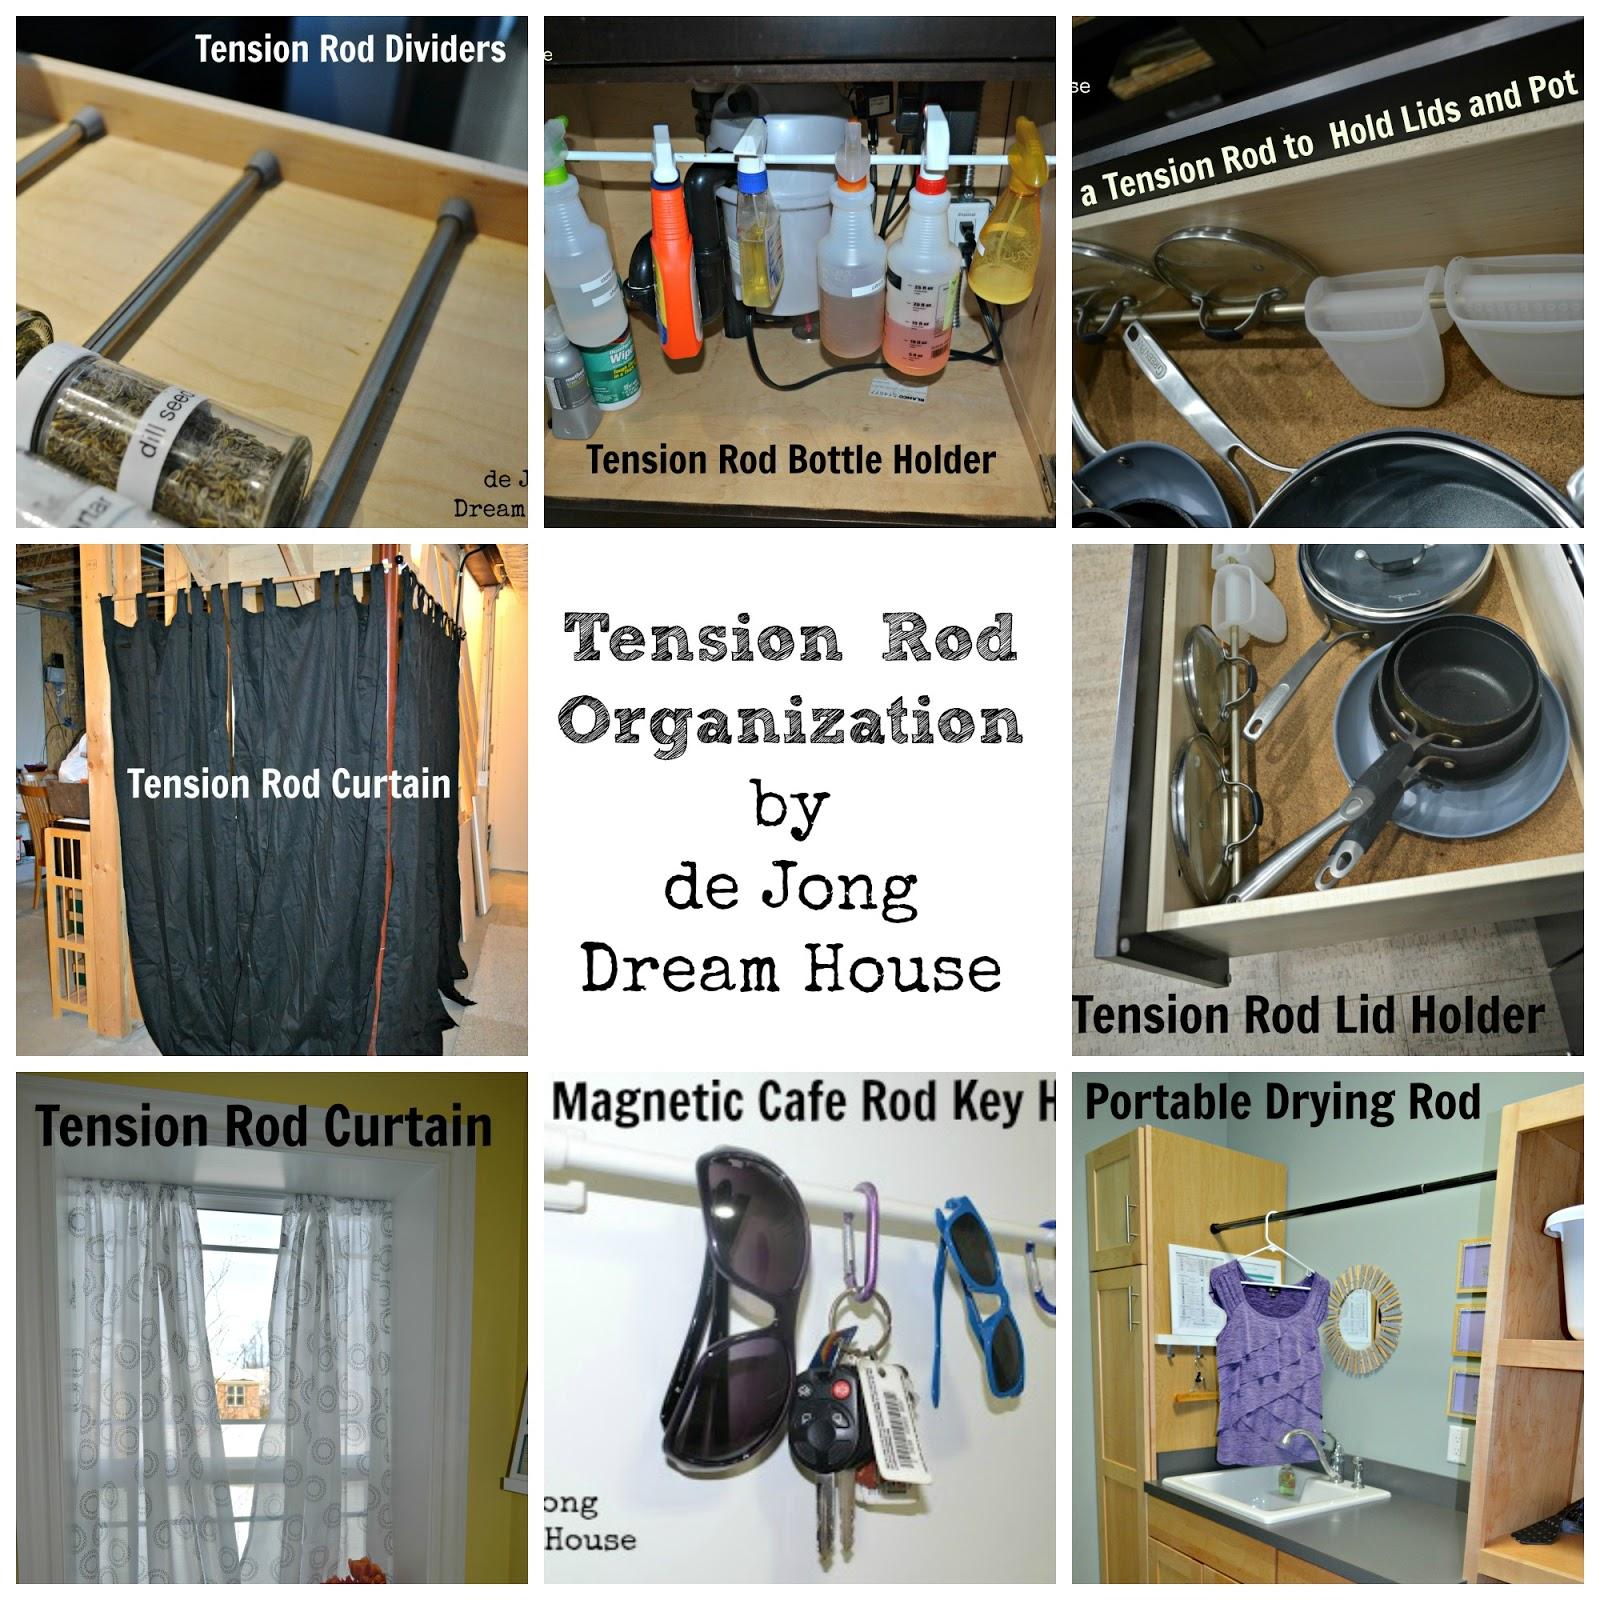 de jong dream house: uses for tension rods